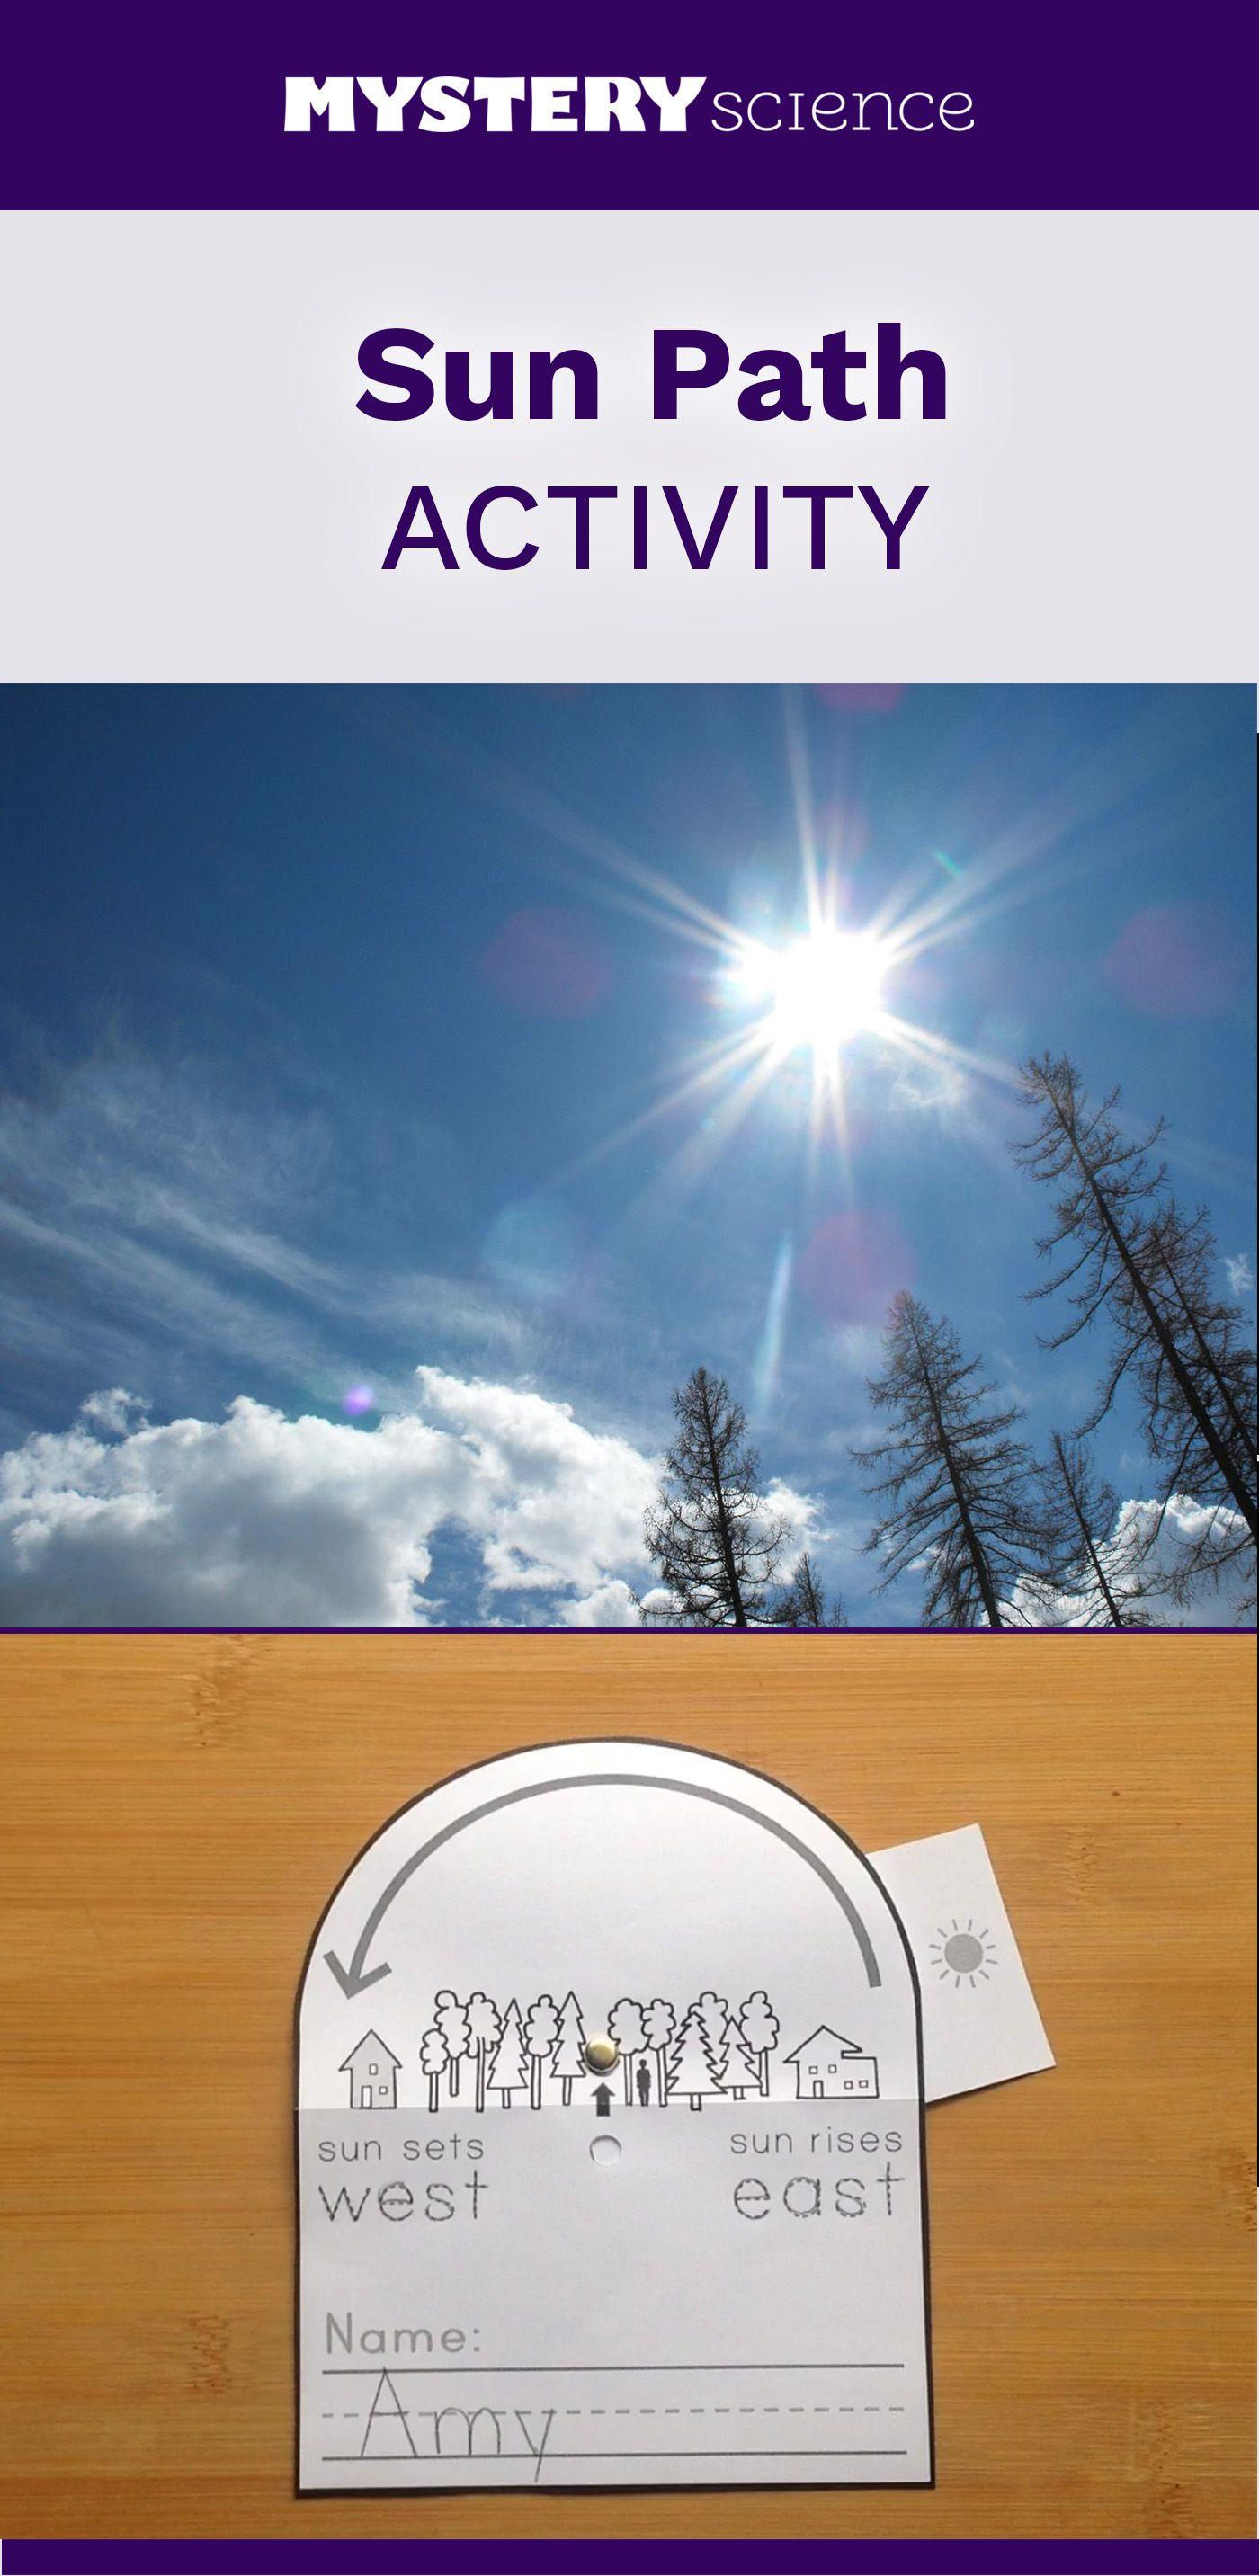 Sun Path Activity